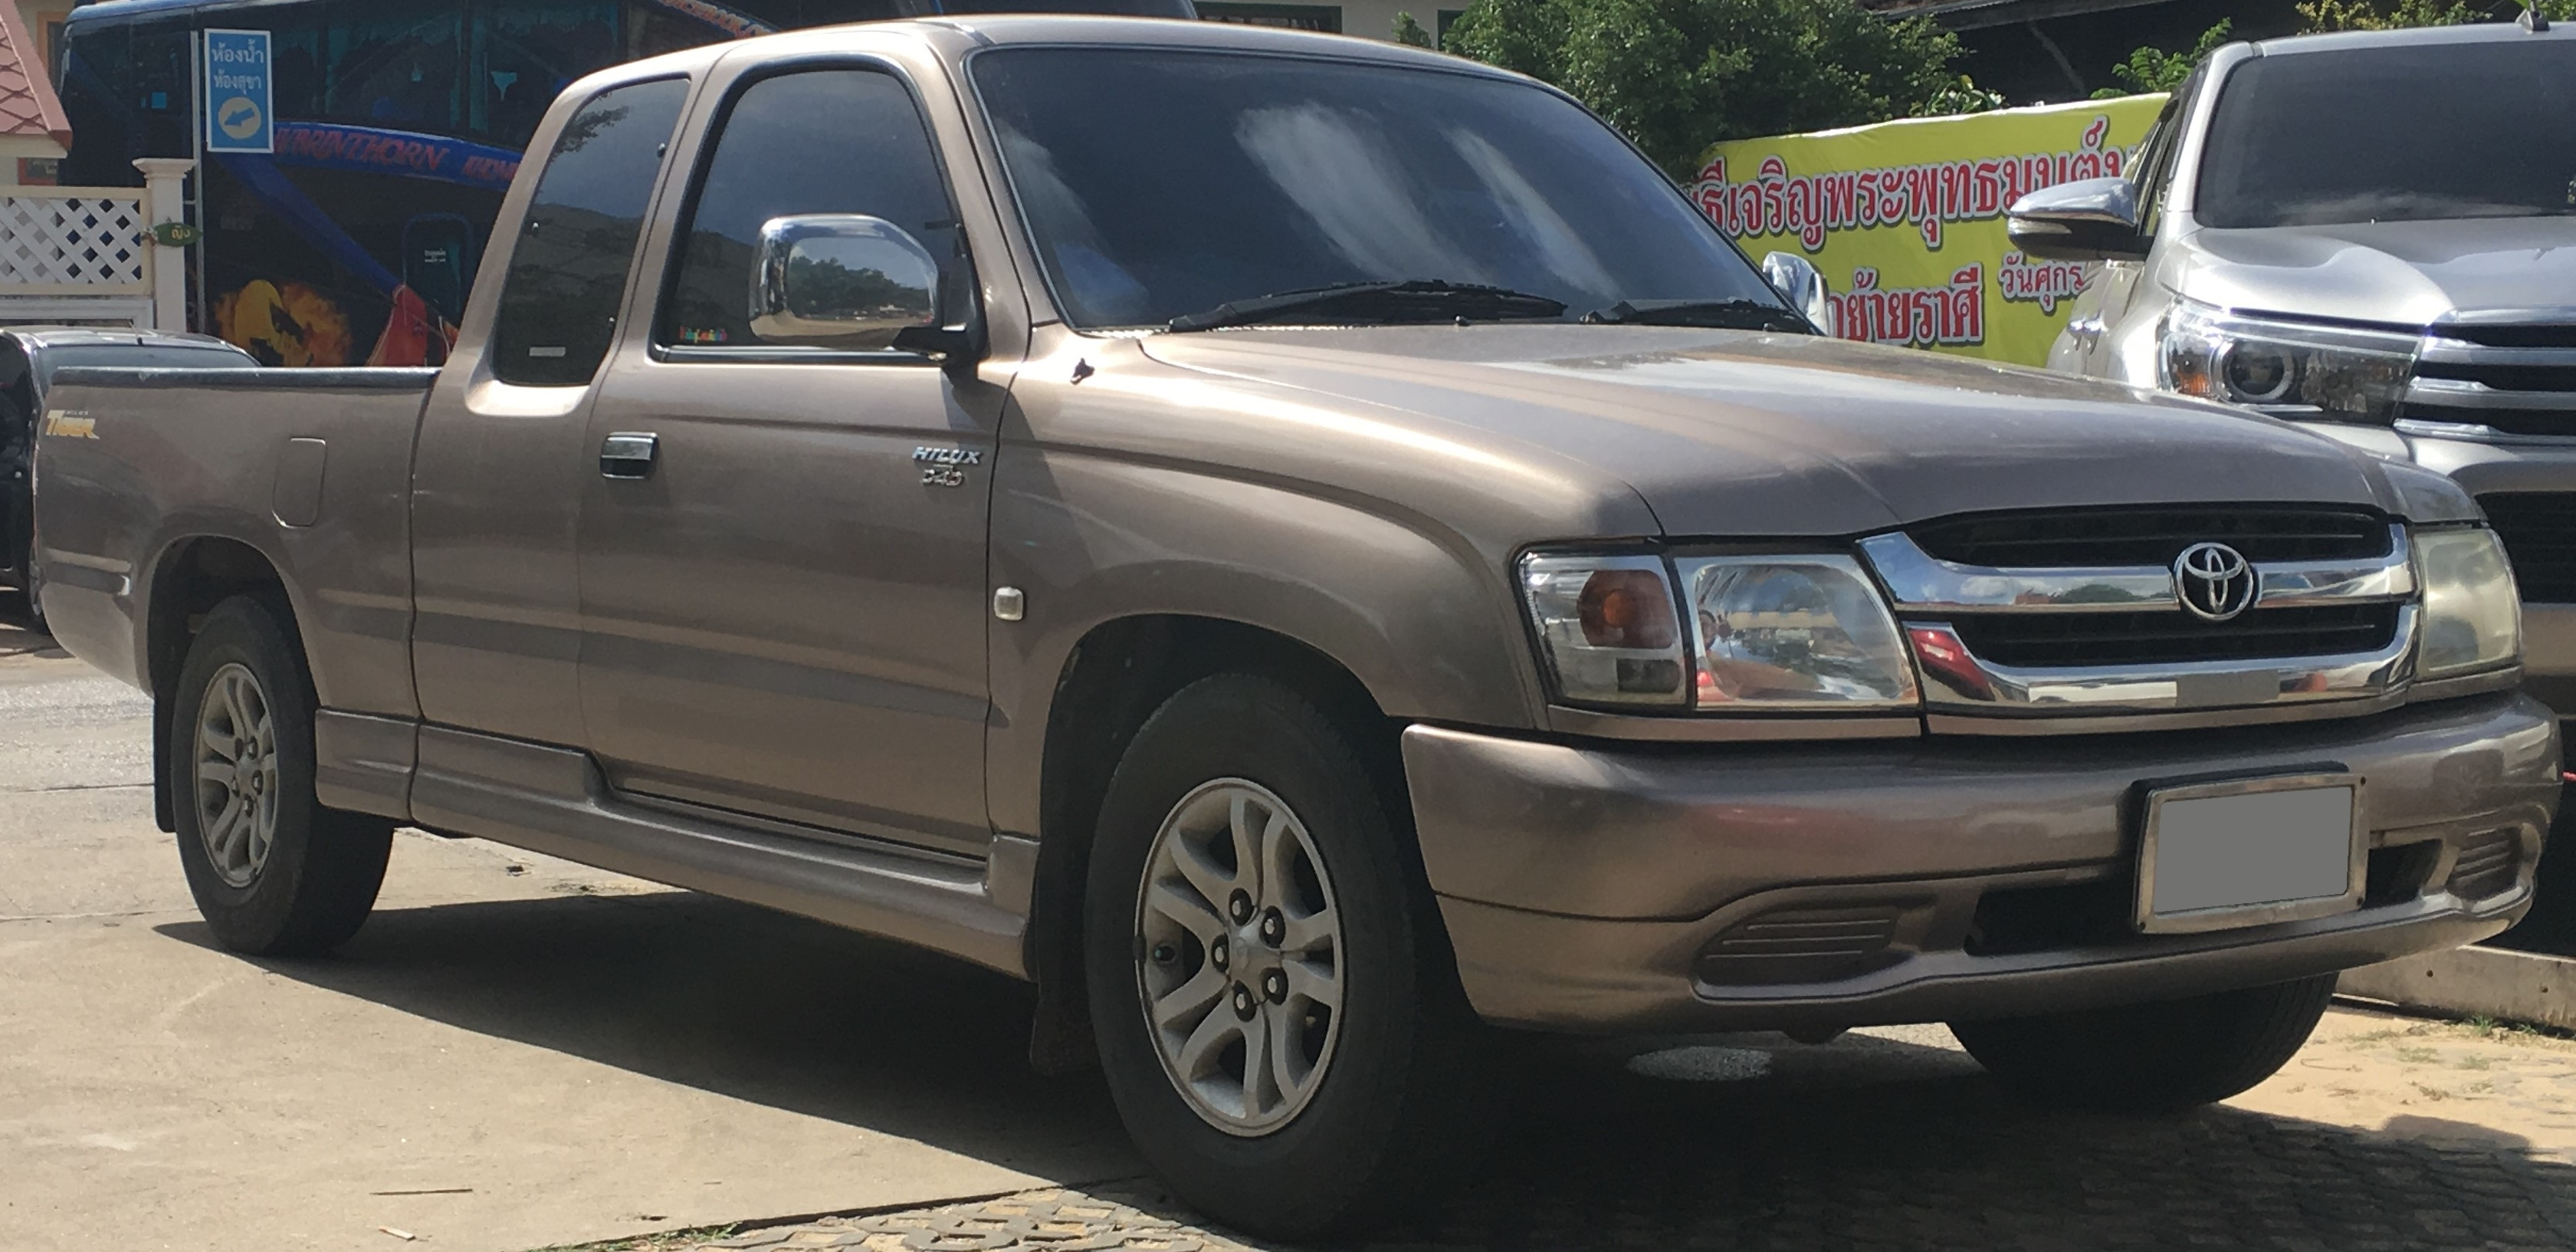 Kelebihan Kekurangan Toyota Hilux 2004 Top Model Tahun Ini